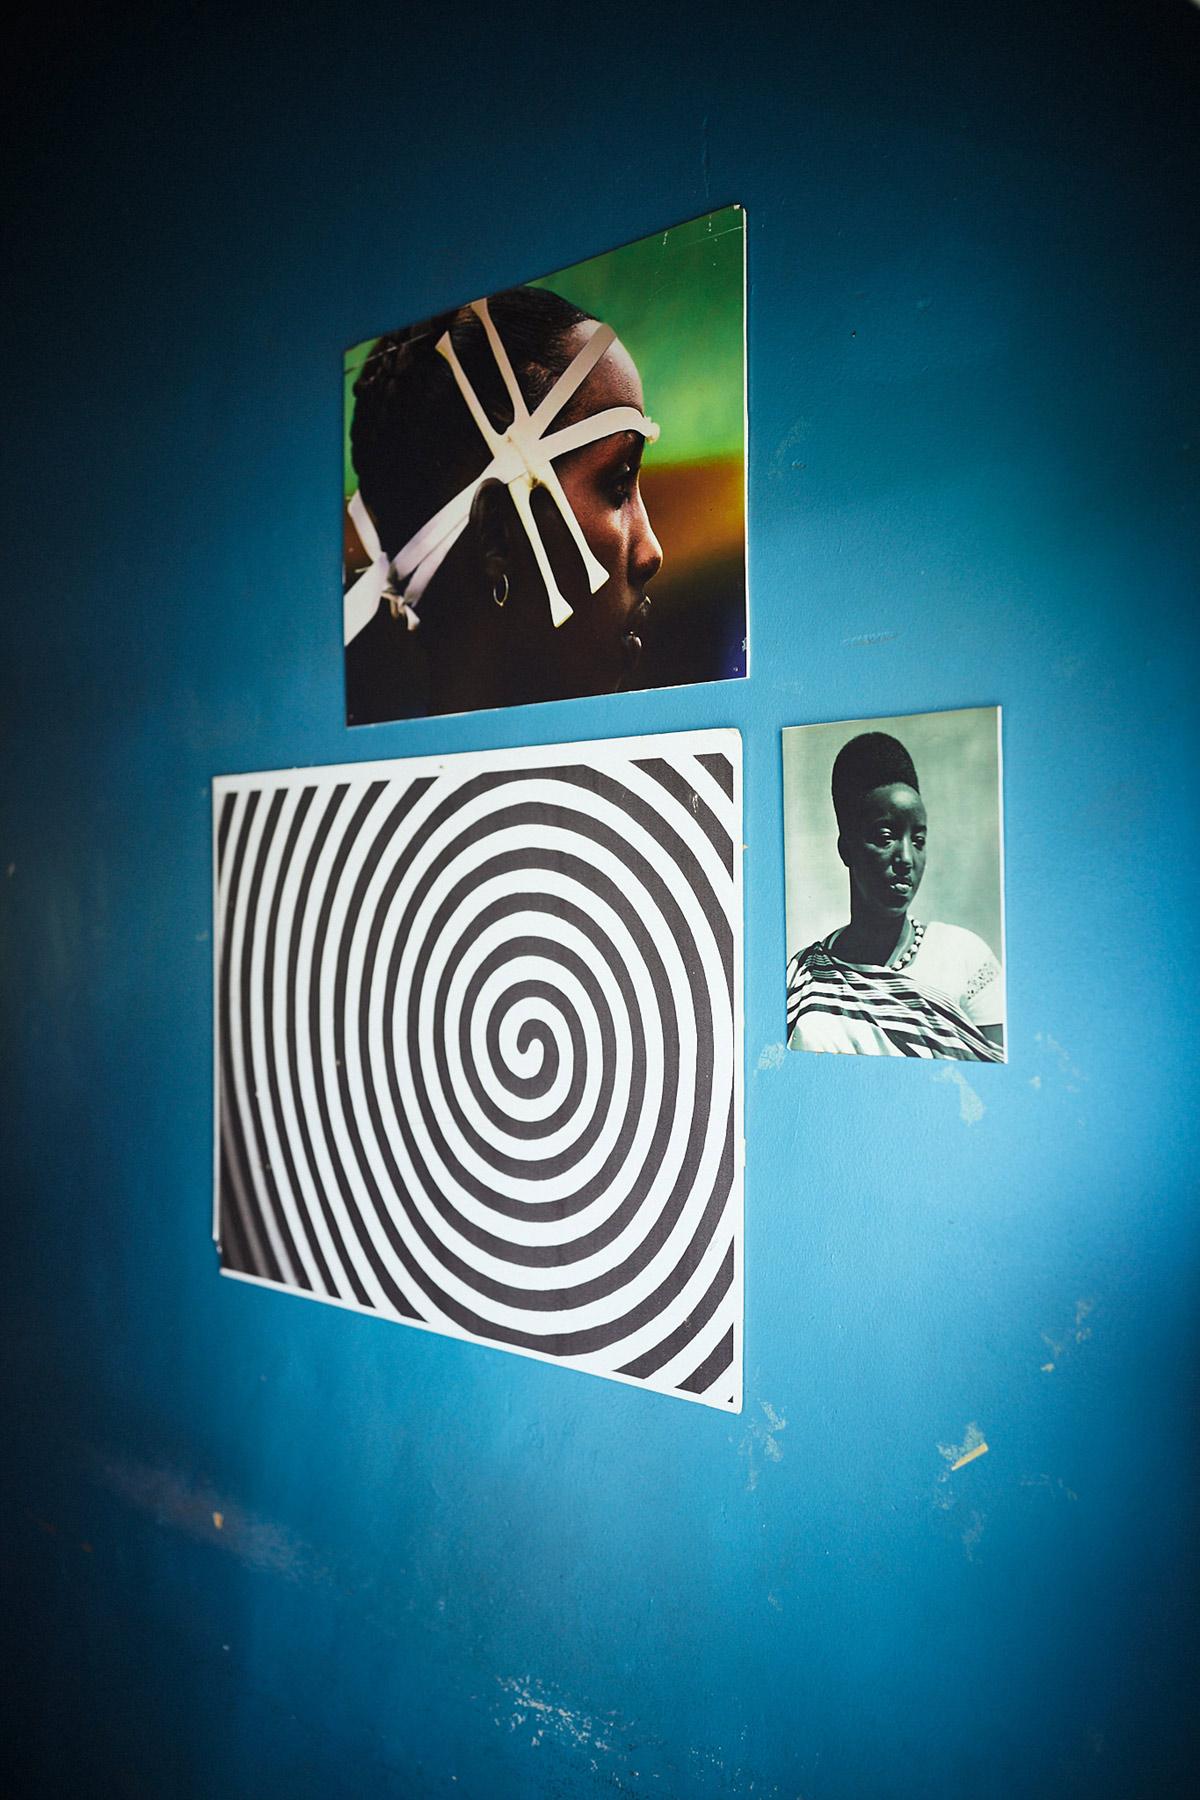 ds19_Slanted_Rwanda_MihirBatt_RwandaCC12915